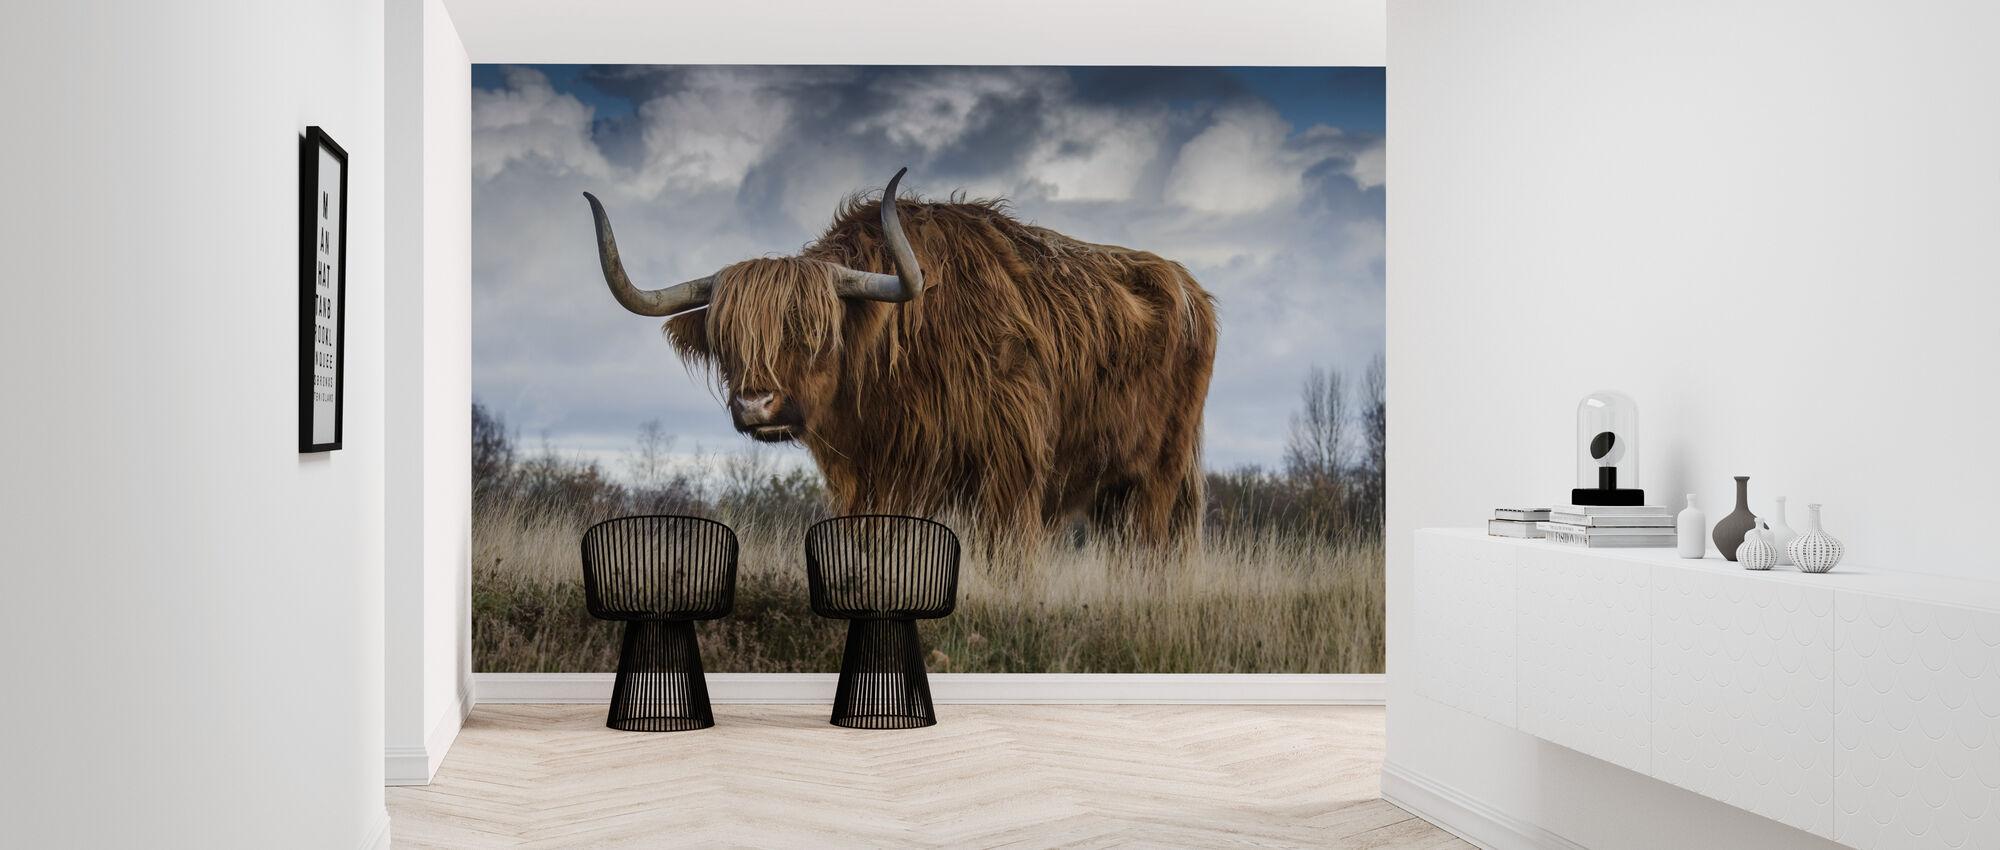 Bull Grazing in the Meadow - Wallpaper - Hallway